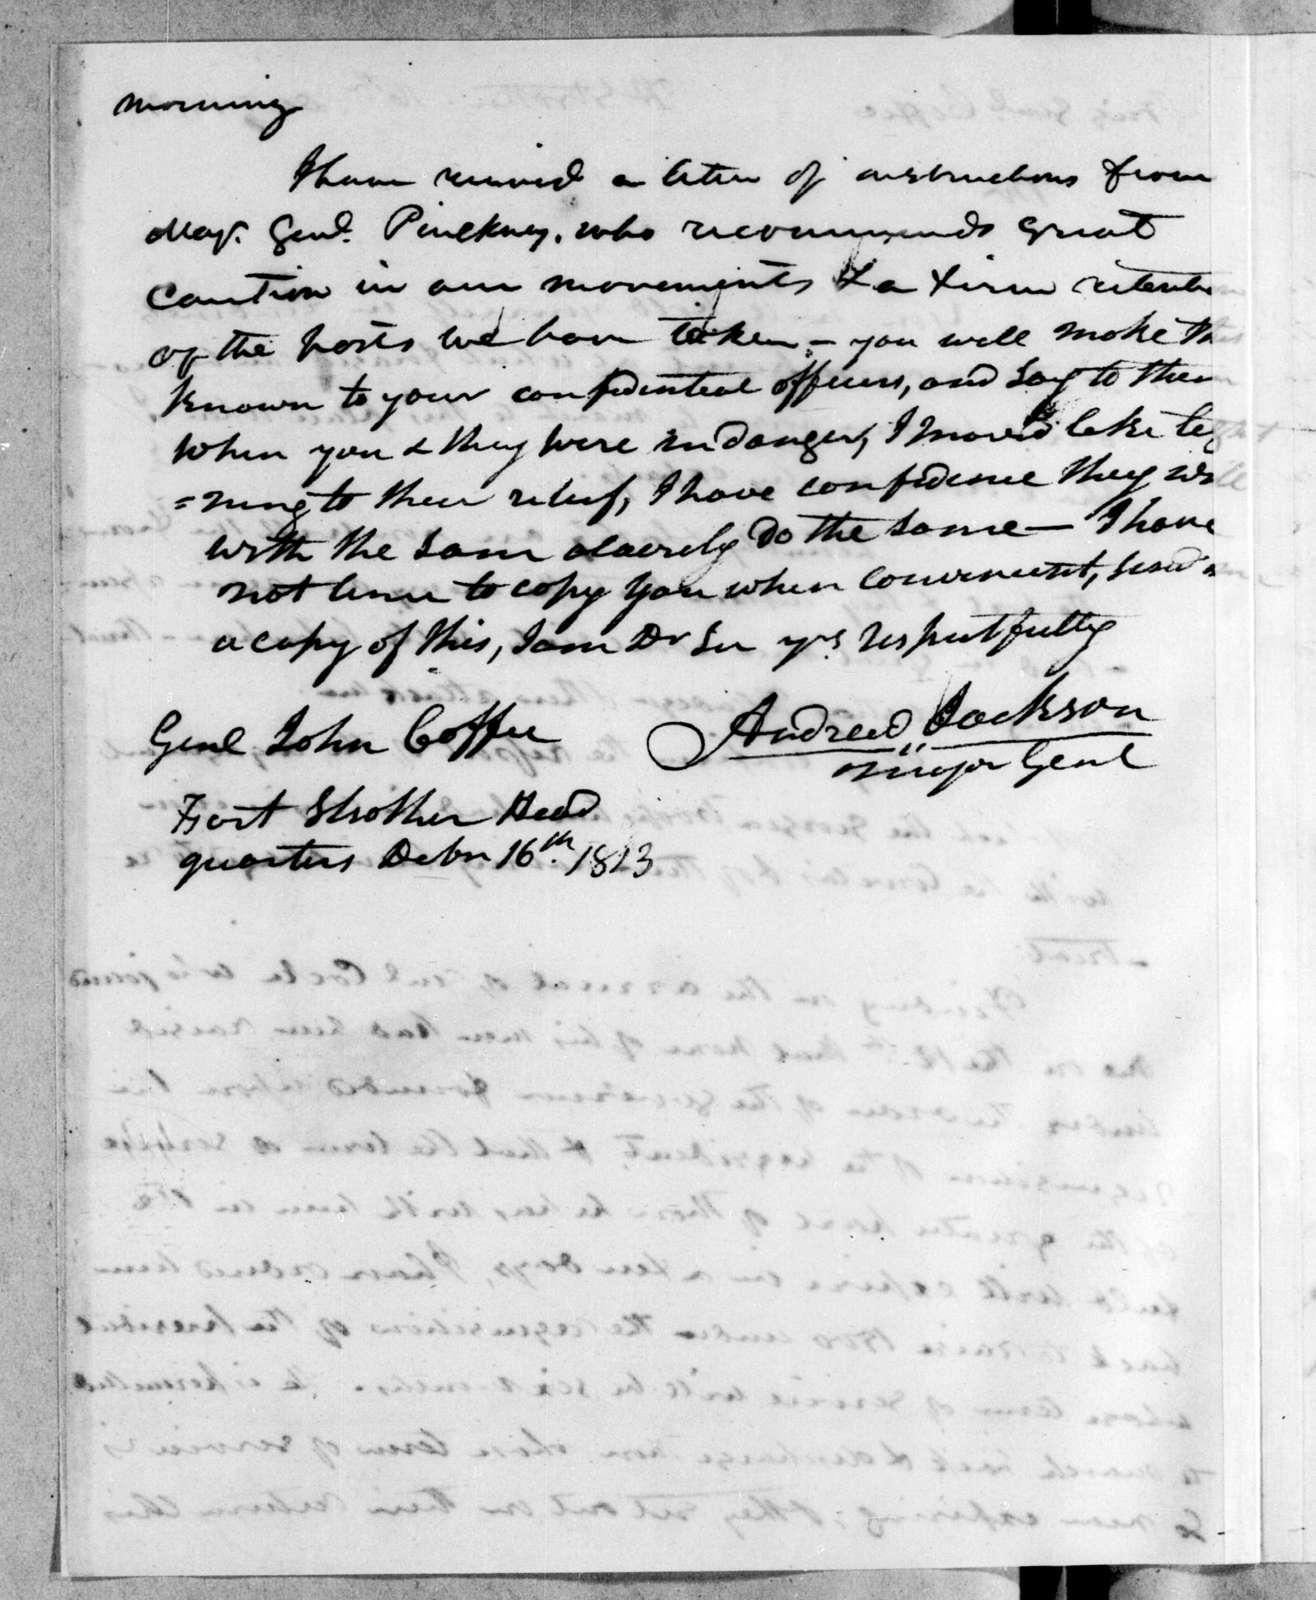 Andrew Jackson to John Coffee, December 16, 1813